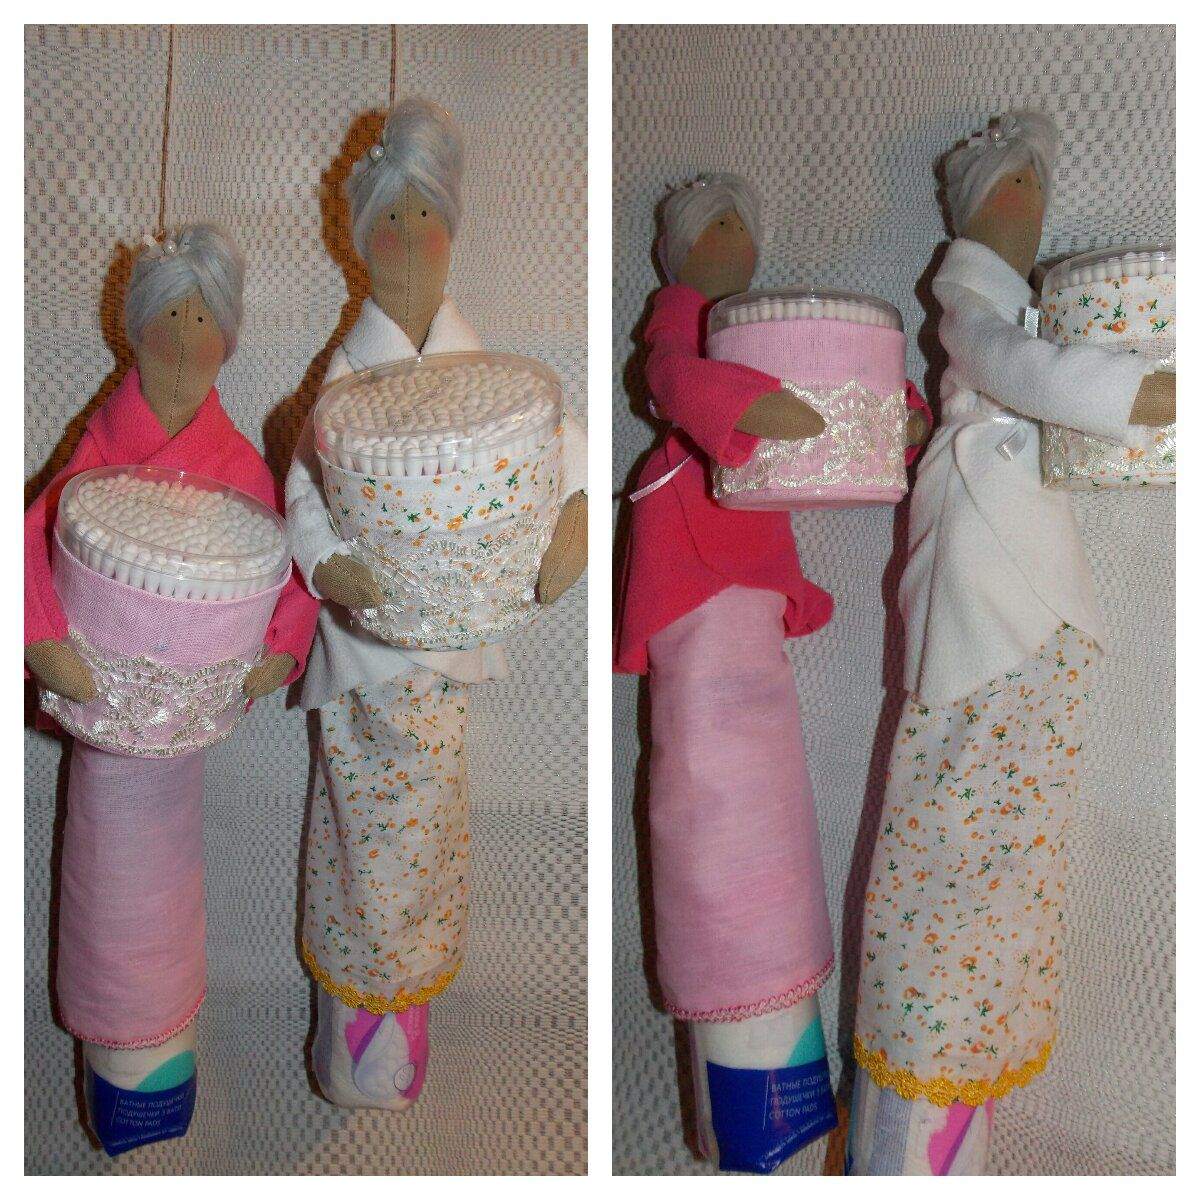 fairy gift present handmade cottonpads cottonbuds